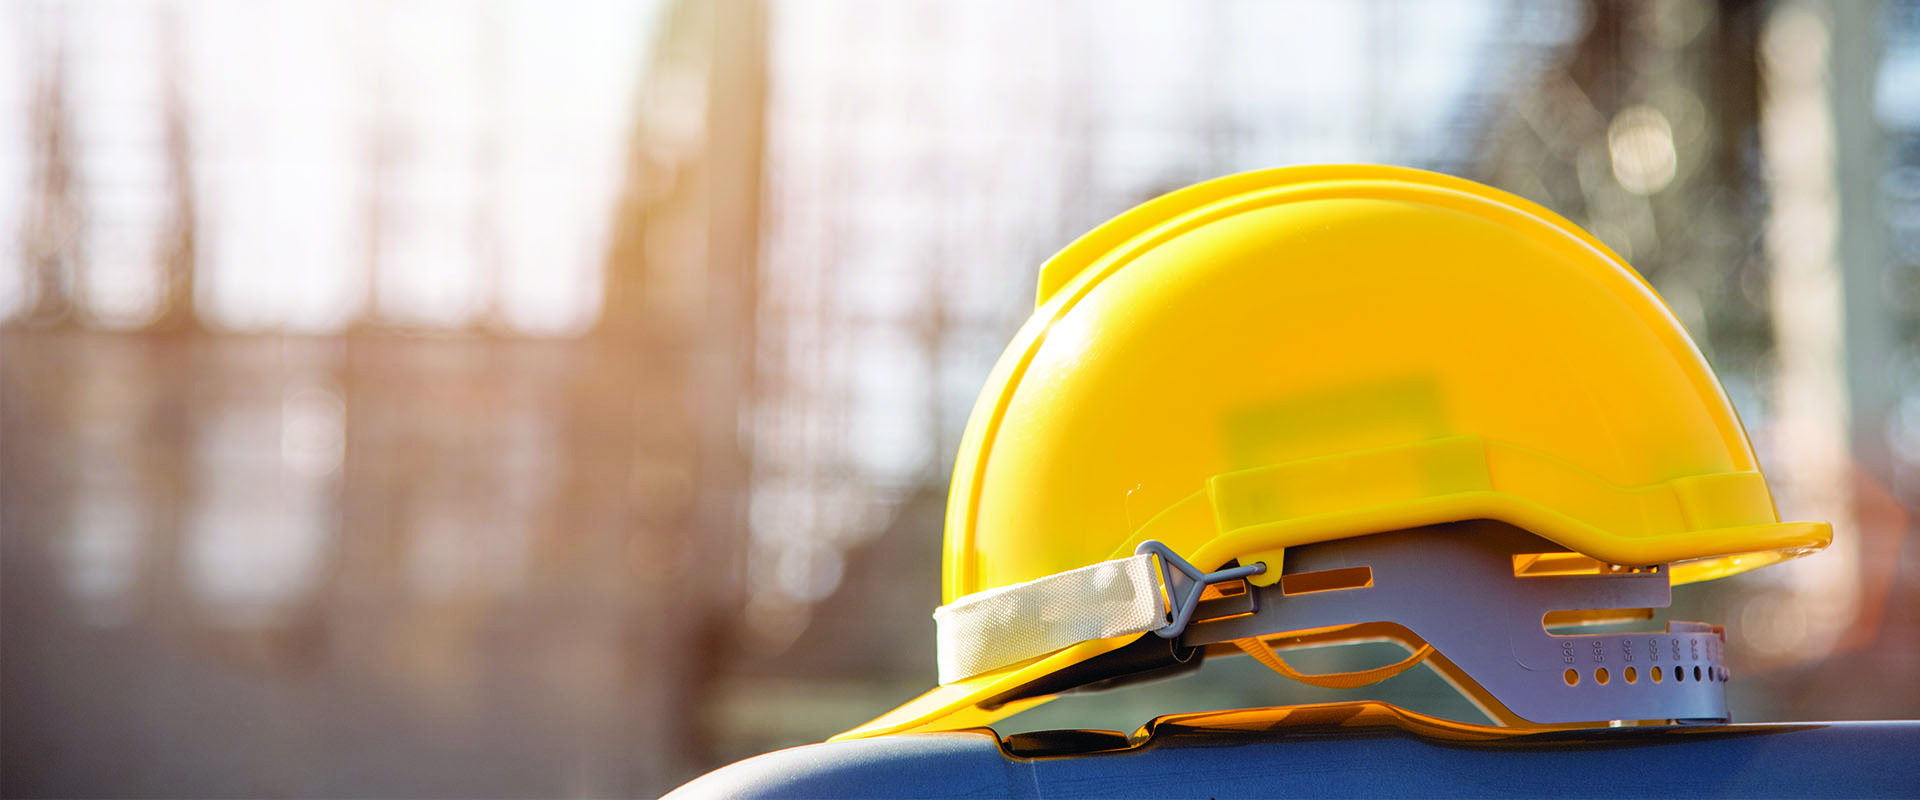 Dangers Facing Construction Workers